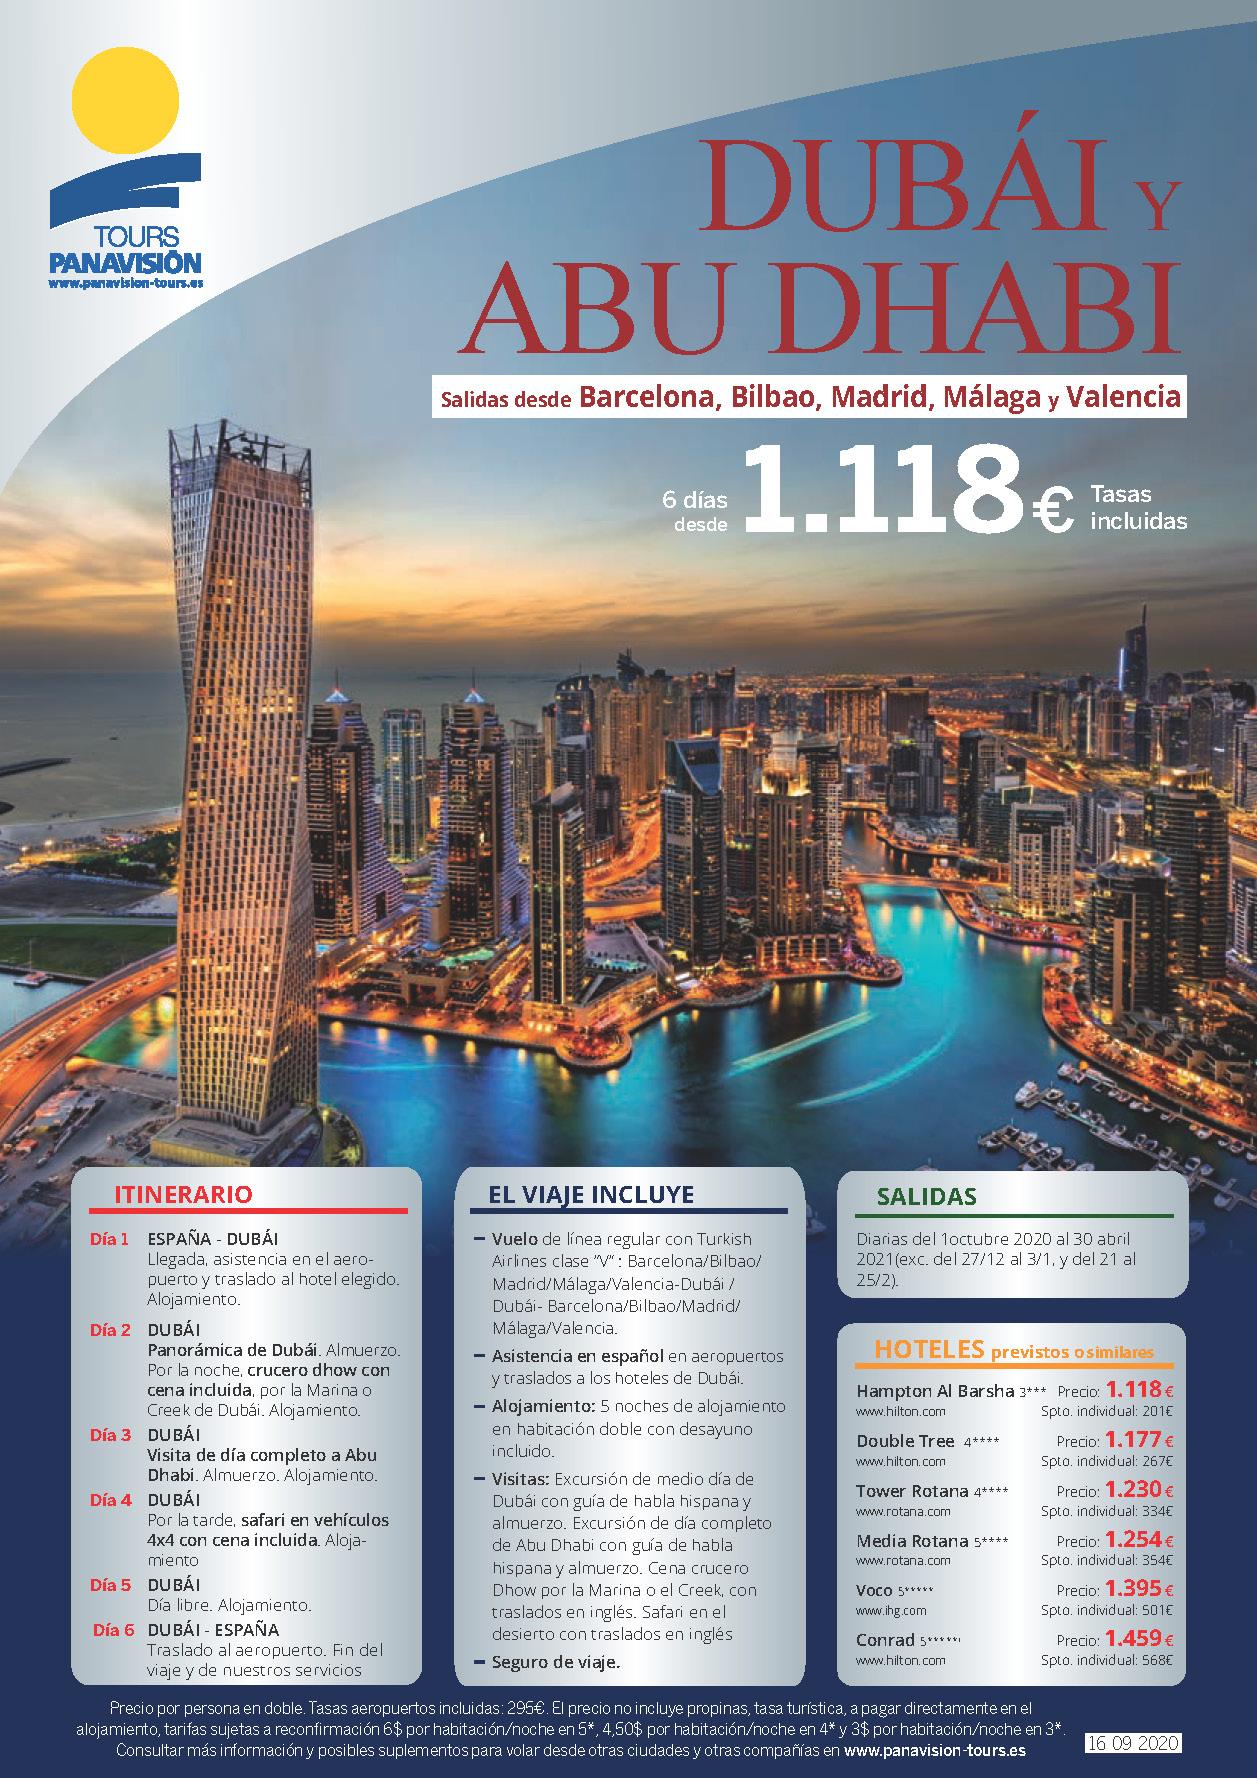 Oferta Panavision Tours Dubai y Abu Dhabi Otono 2020 e Invierno 2021 salidas Madrid Barcelona Bilbao Malaga y Valencia